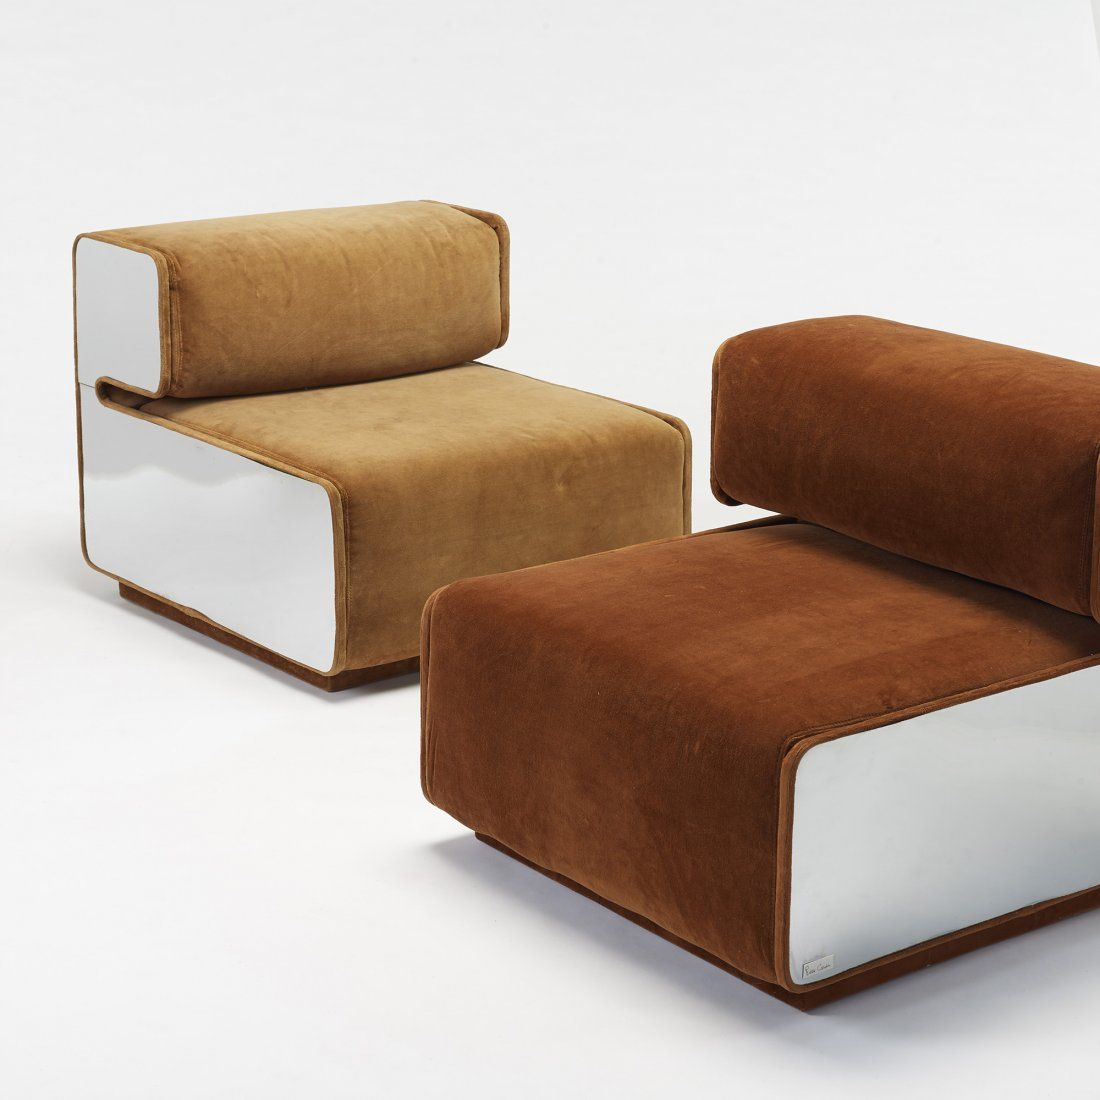 Pierre cardin lounge chairs pair on meubles pinterest pierre cardin lounge et pierre - Chaise cobra studio pierre cardin ...